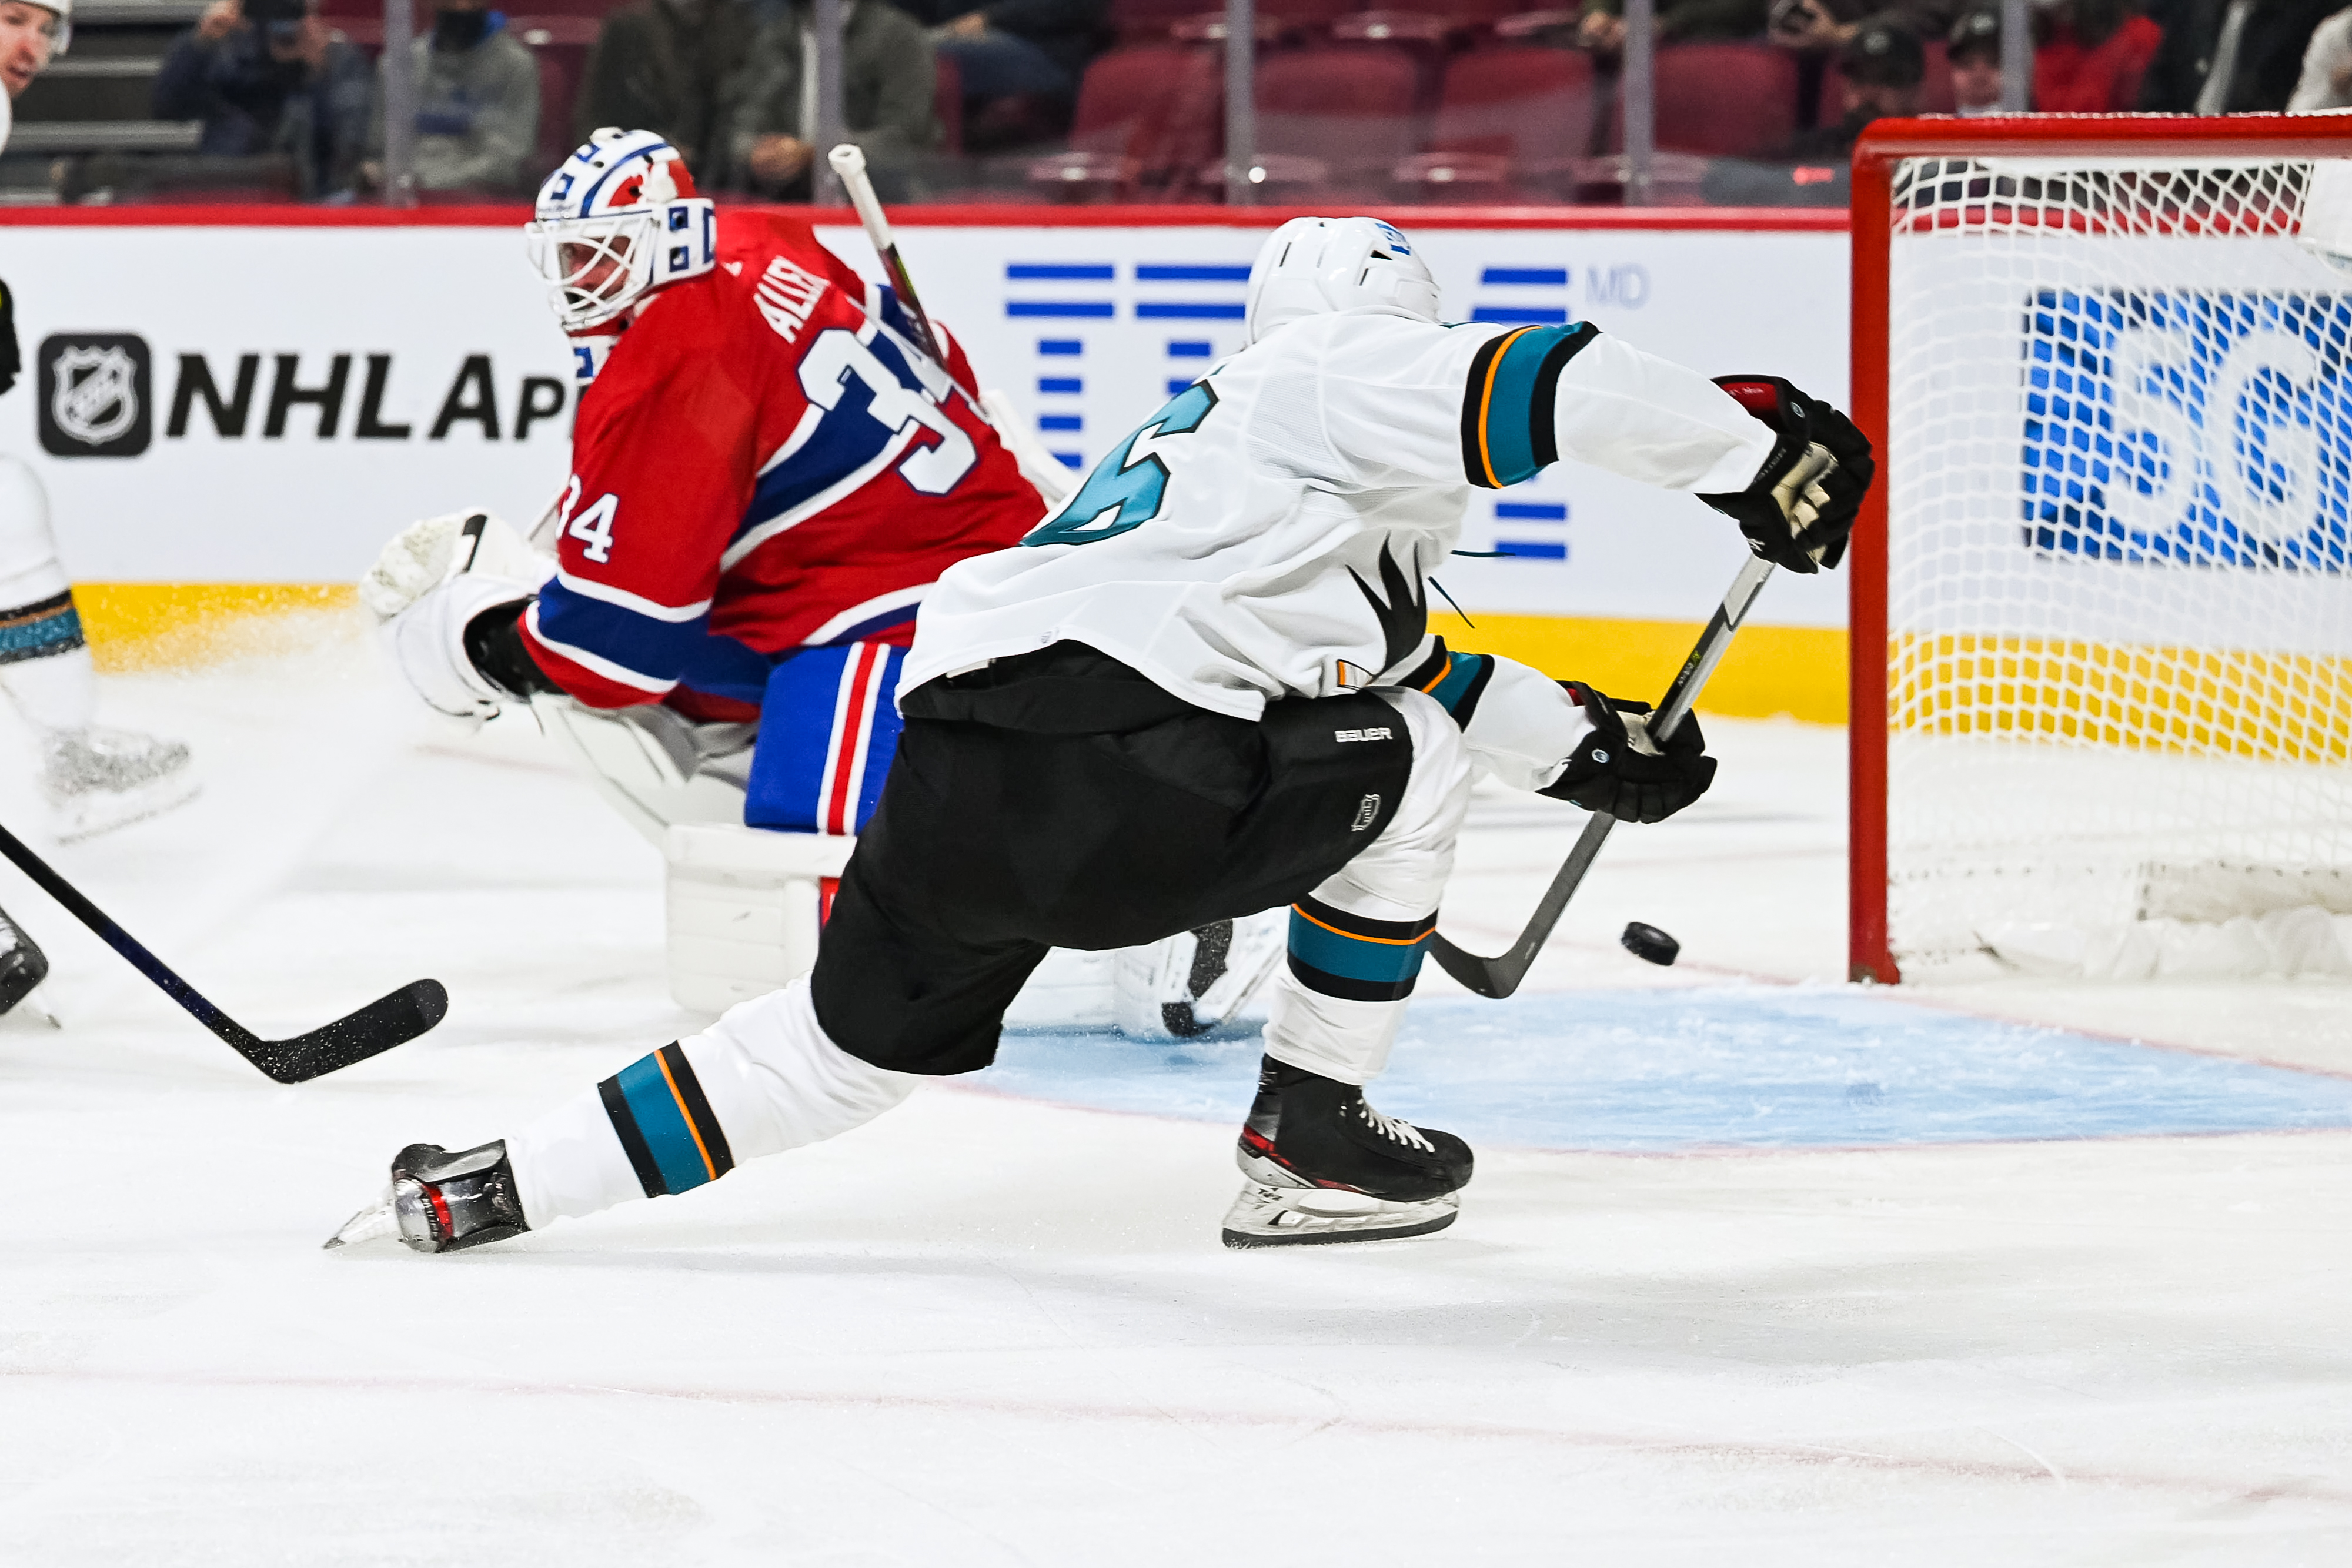 NHL: OCT 19 Sharks at Canadiens